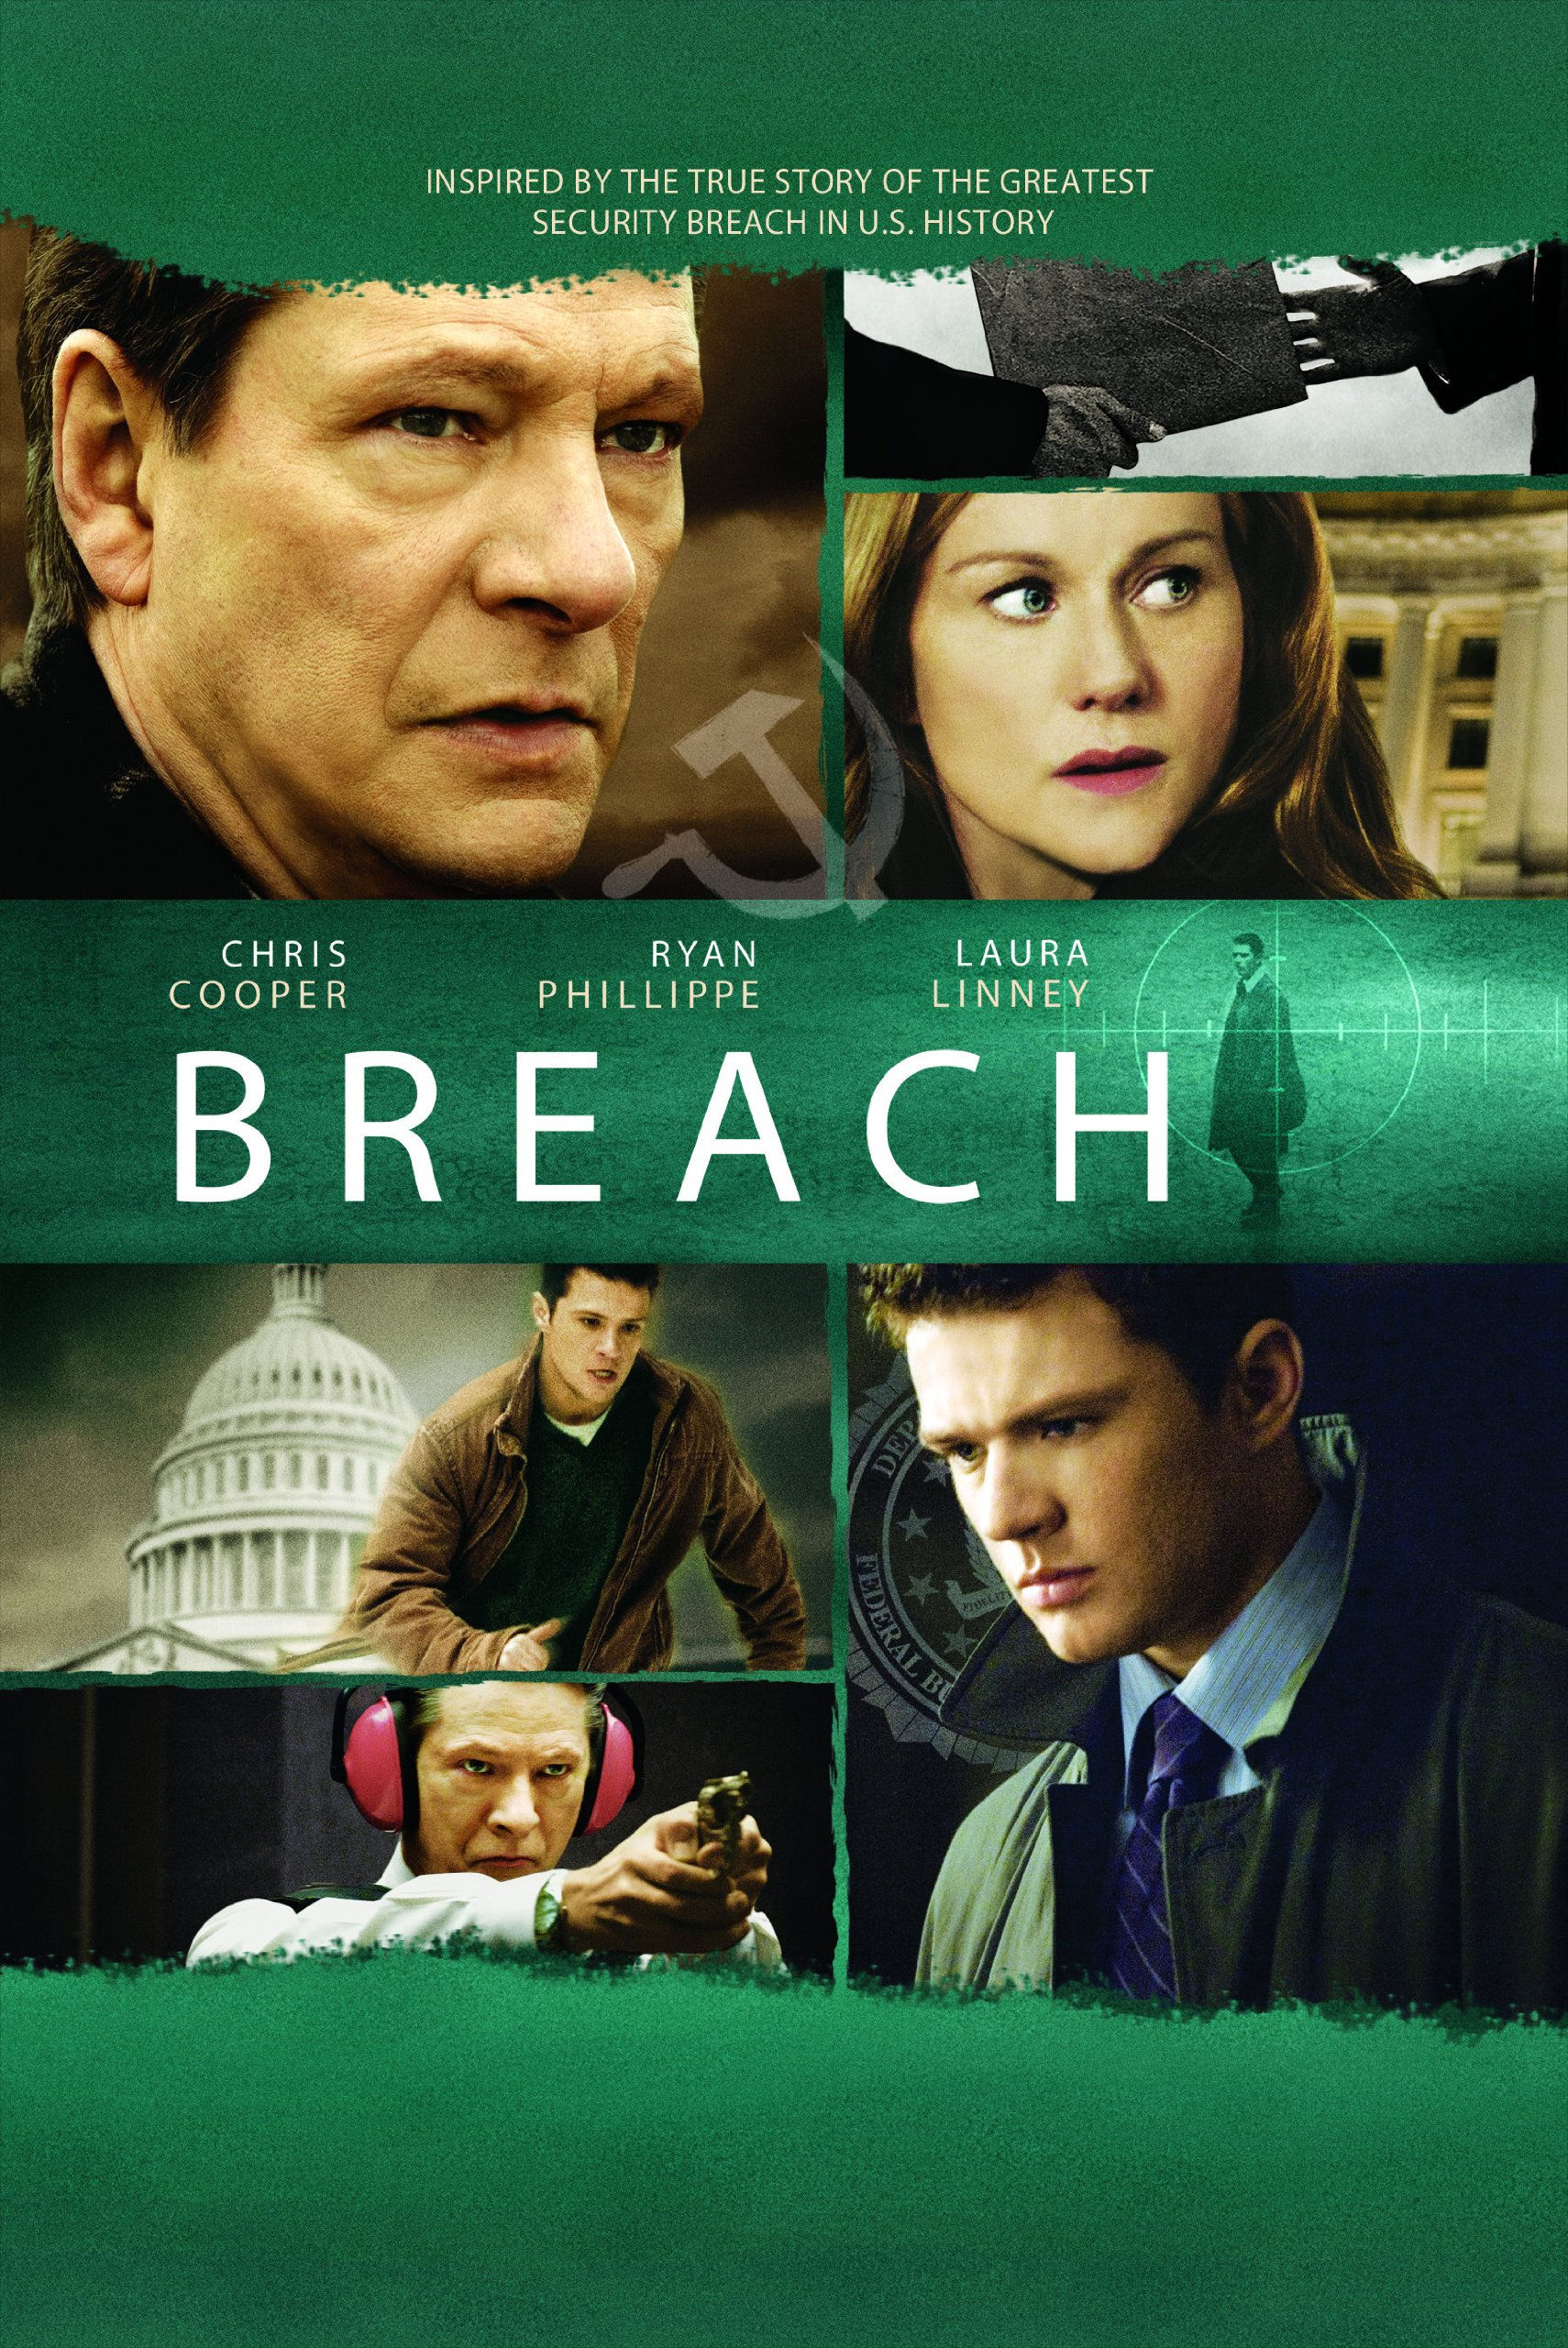 Breach by